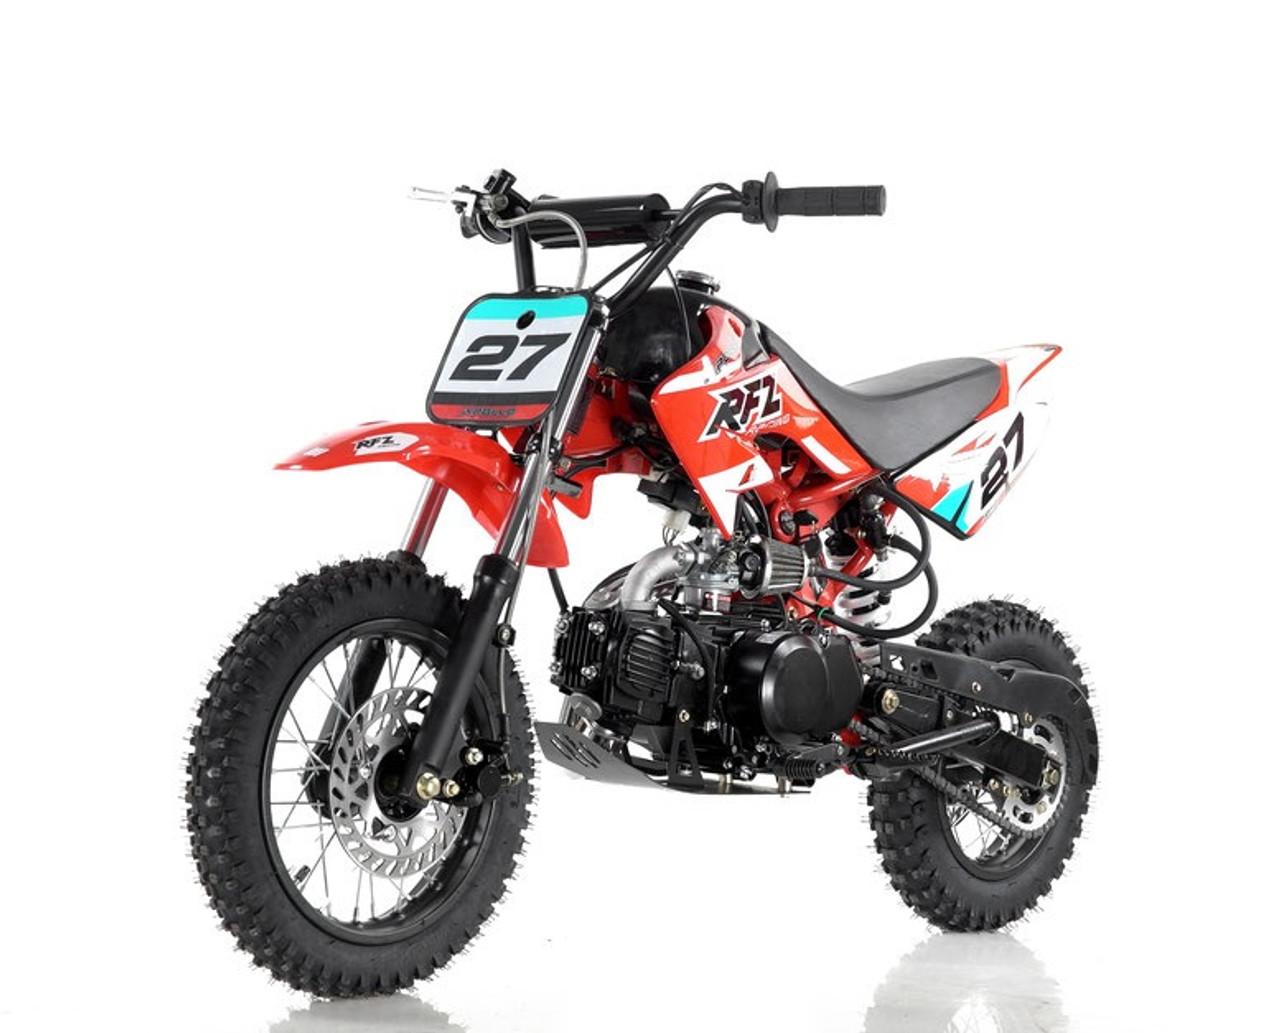 Vitacci DB-27 110cc Dirt Bike, Semi Automatic (4 Gears) And Kick Start - Fully Assembled and Tested